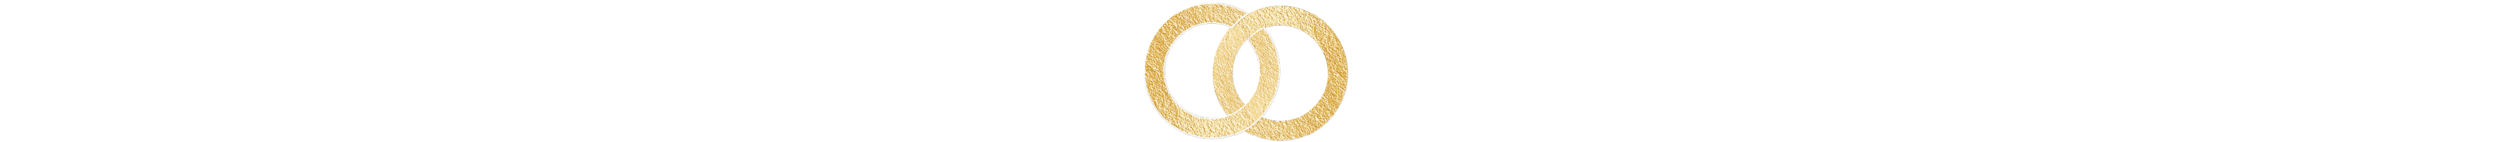 Website_Gold_Divider_Banner_Interlocking_Circles copy.png